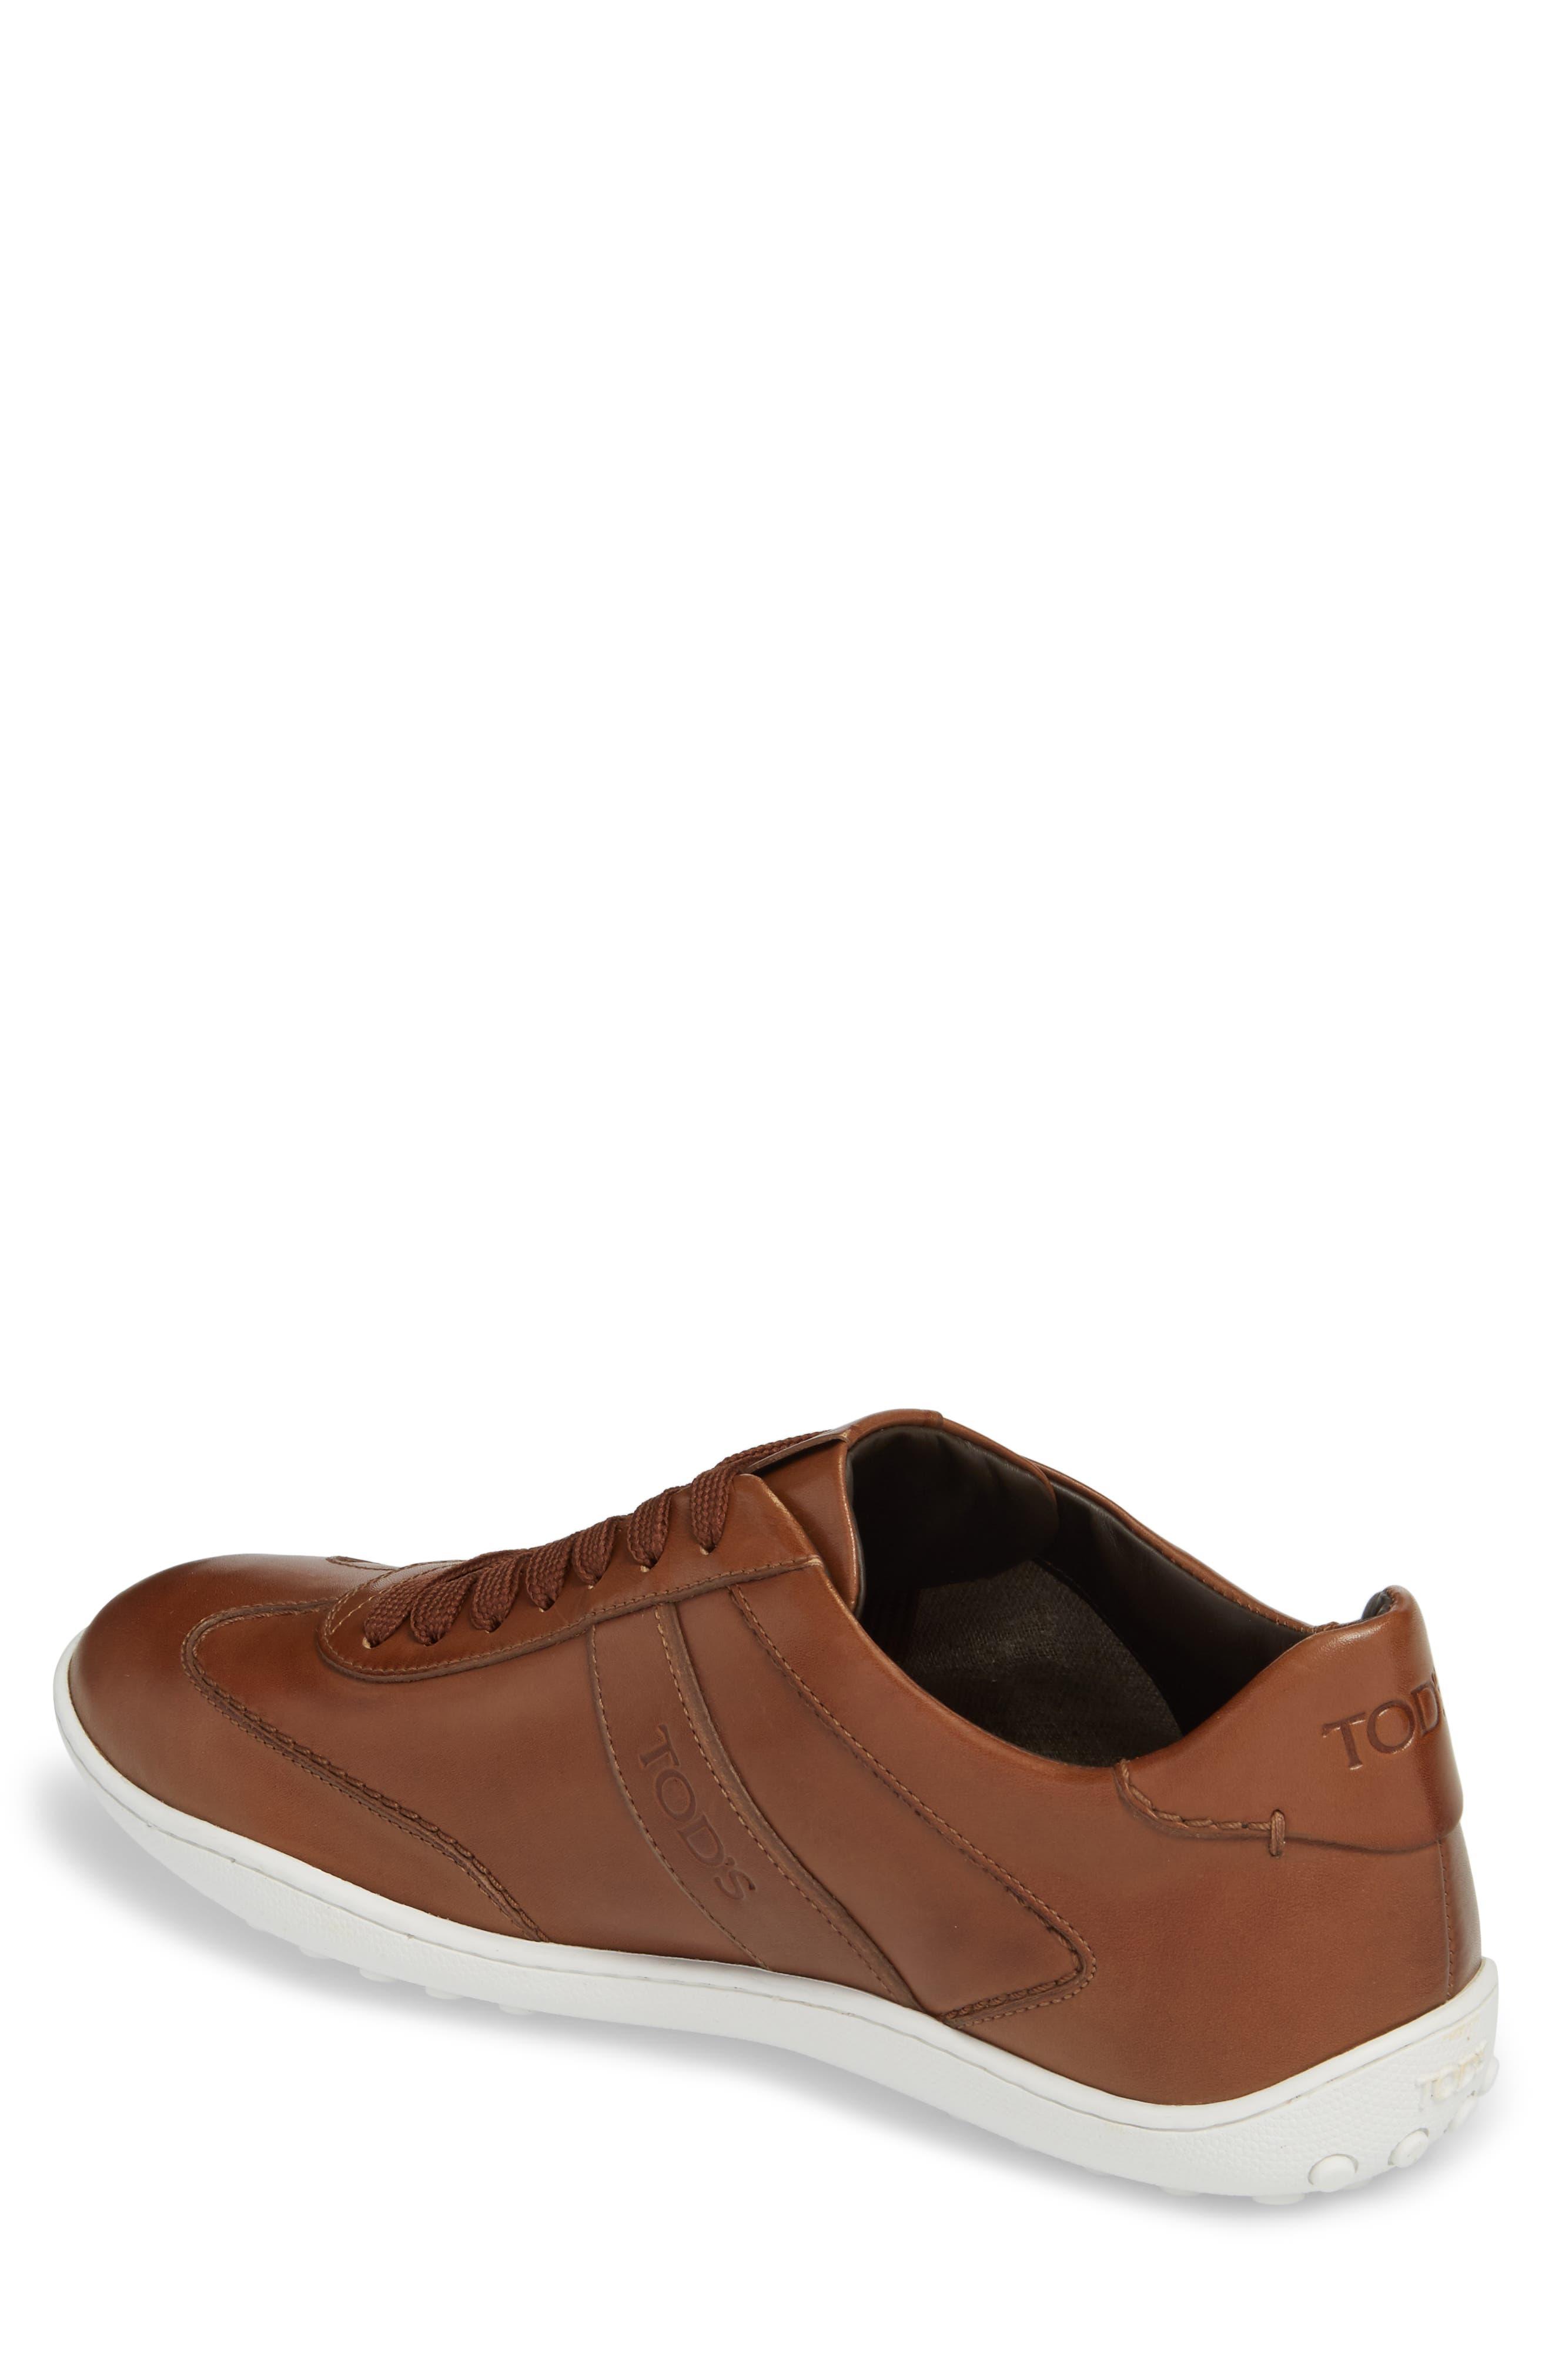 Alternate Image 2  - Tod's Owen Sneaker (Men)